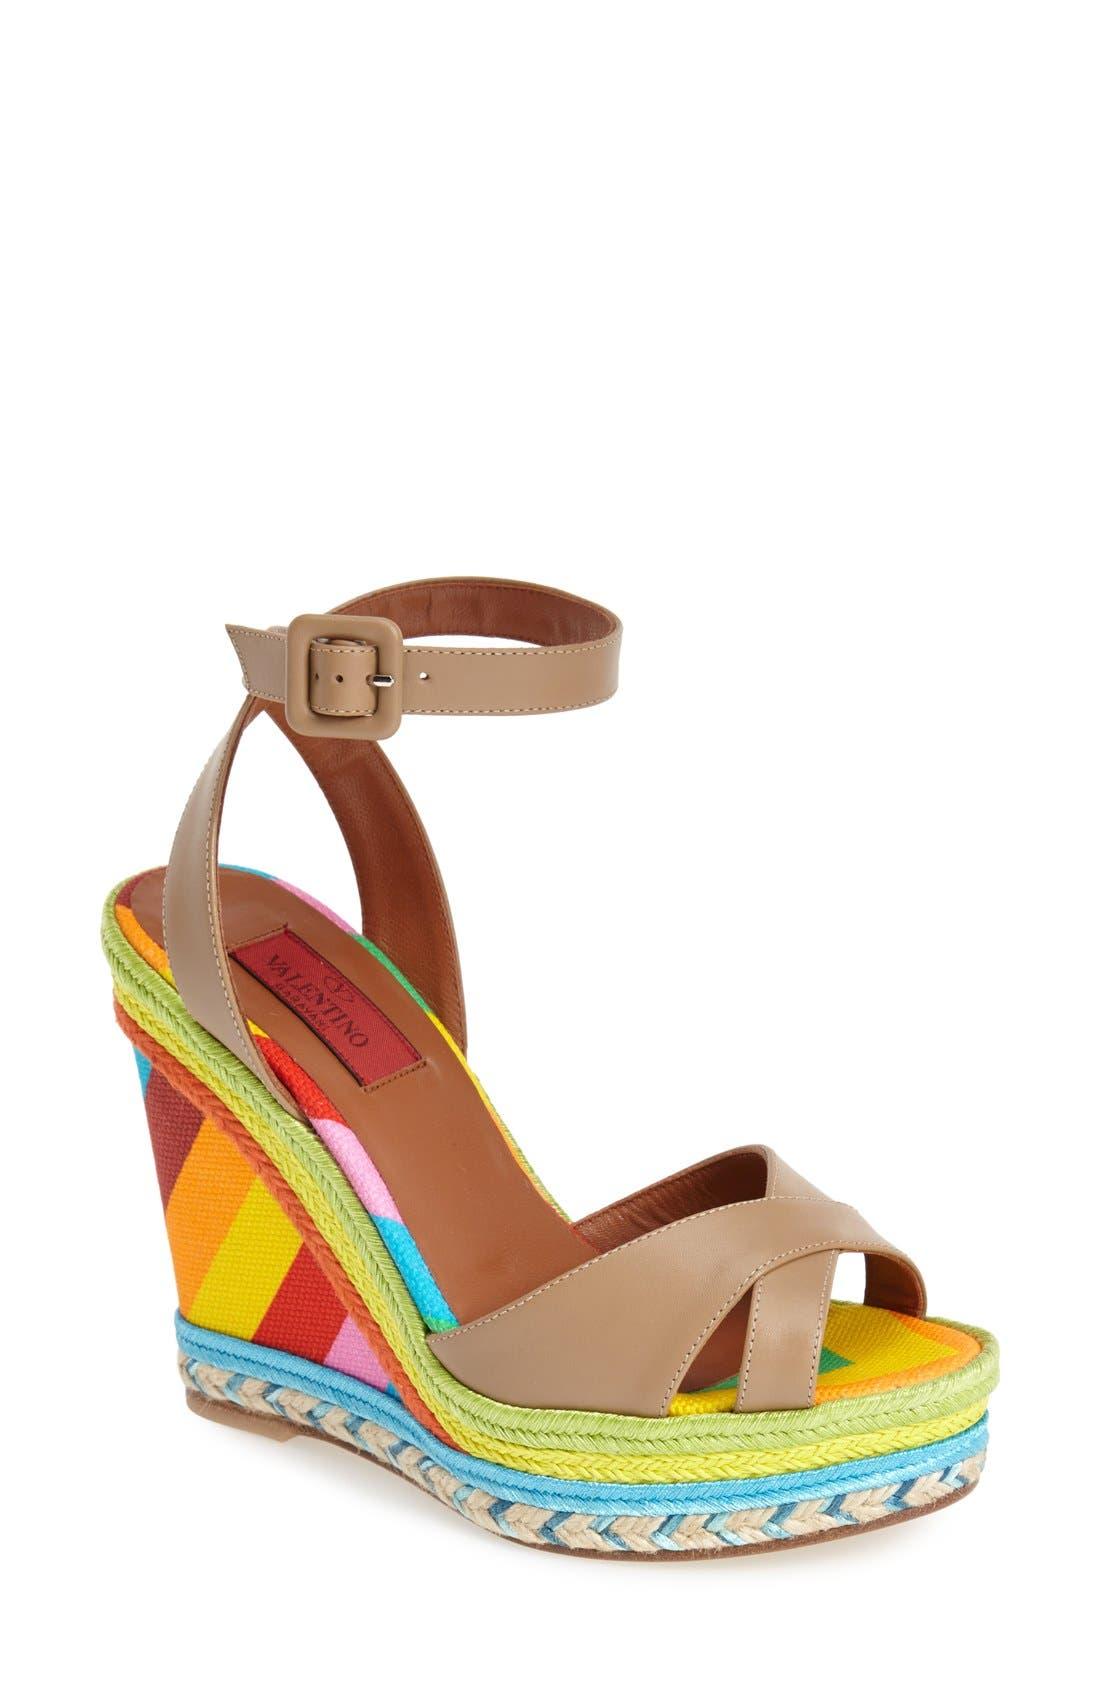 Alternate Image 1 Selected - Valentino Espadrille Wedge Sandal (Women)